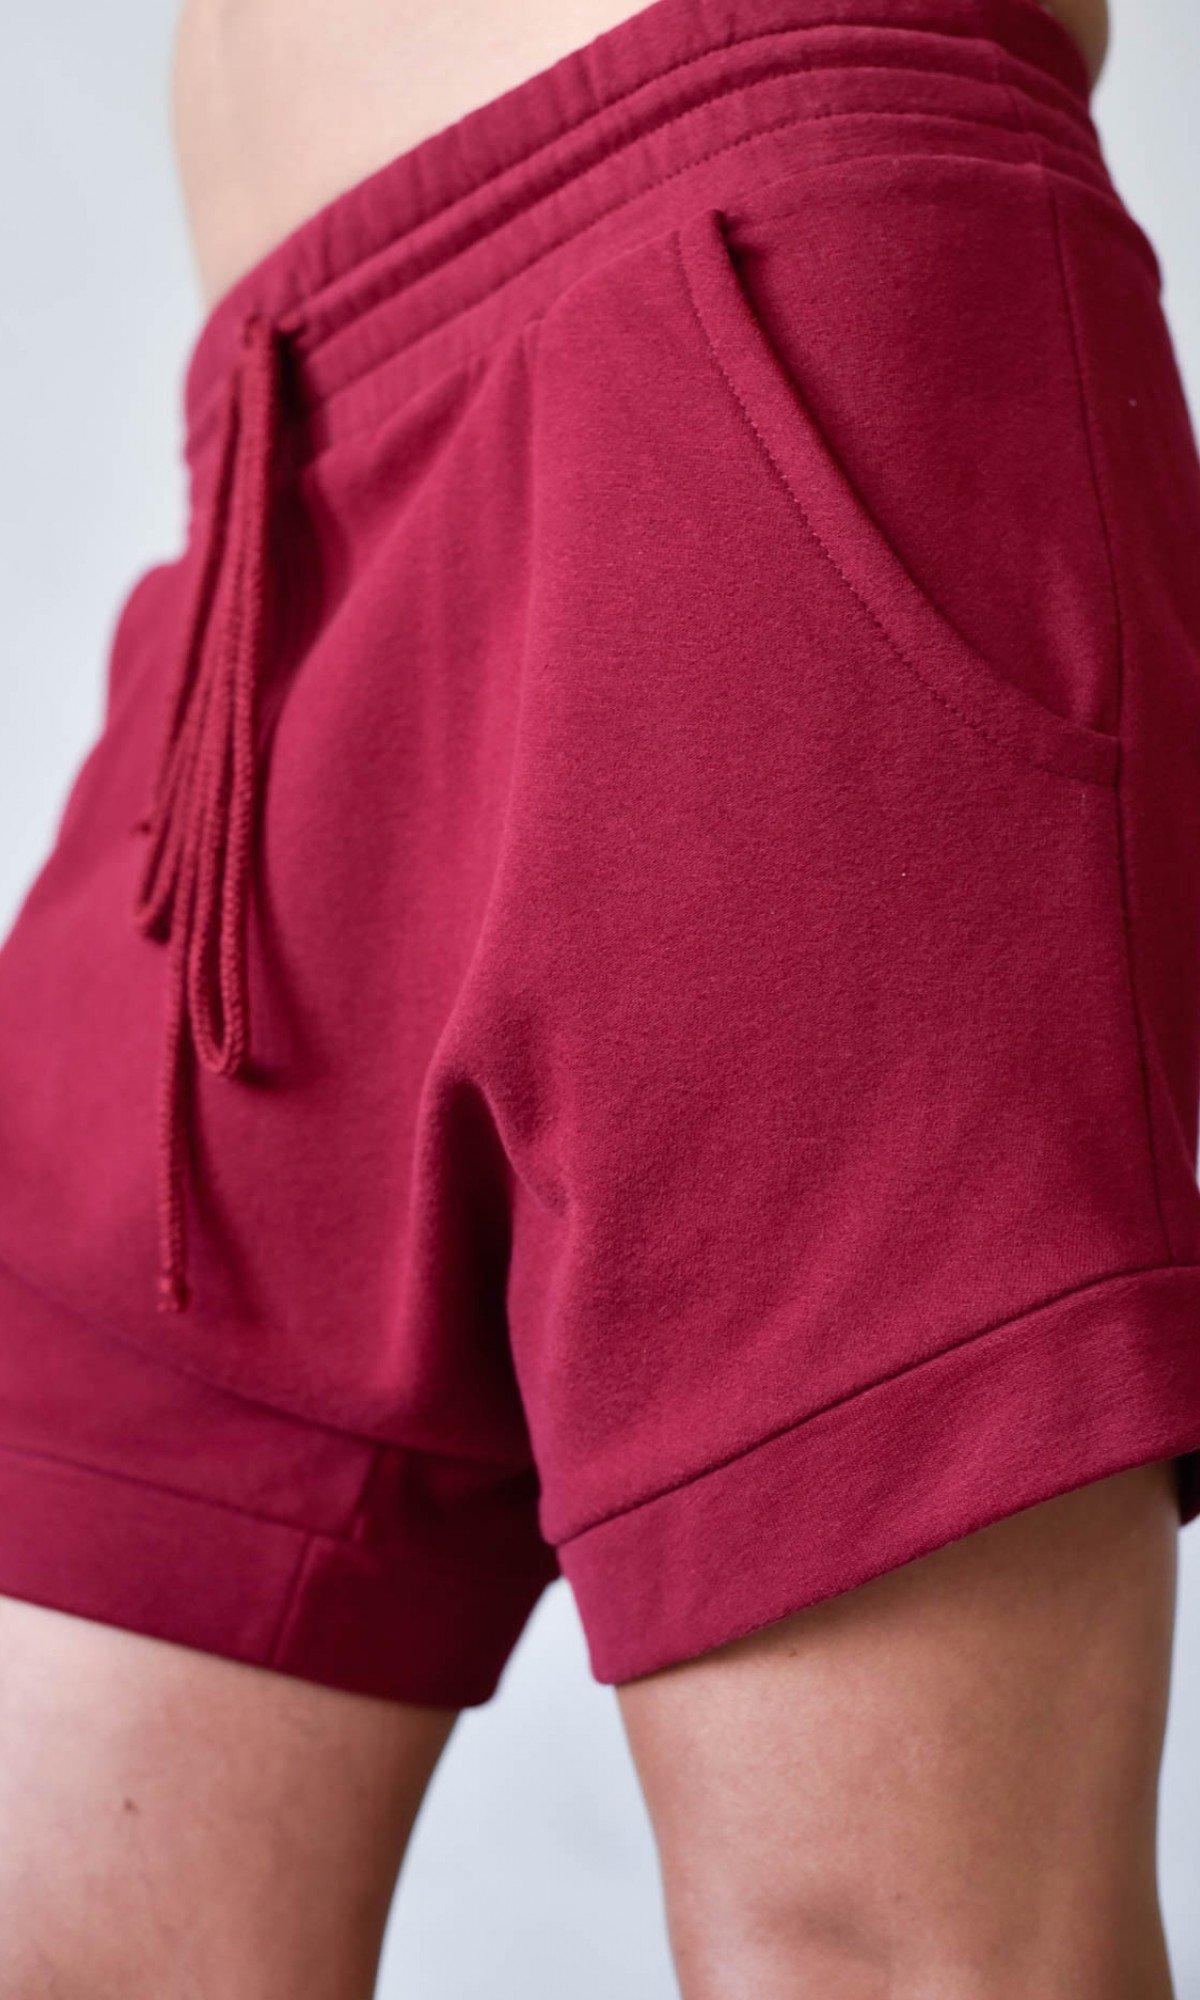 Cotton Drop Crotch Shorts A05738